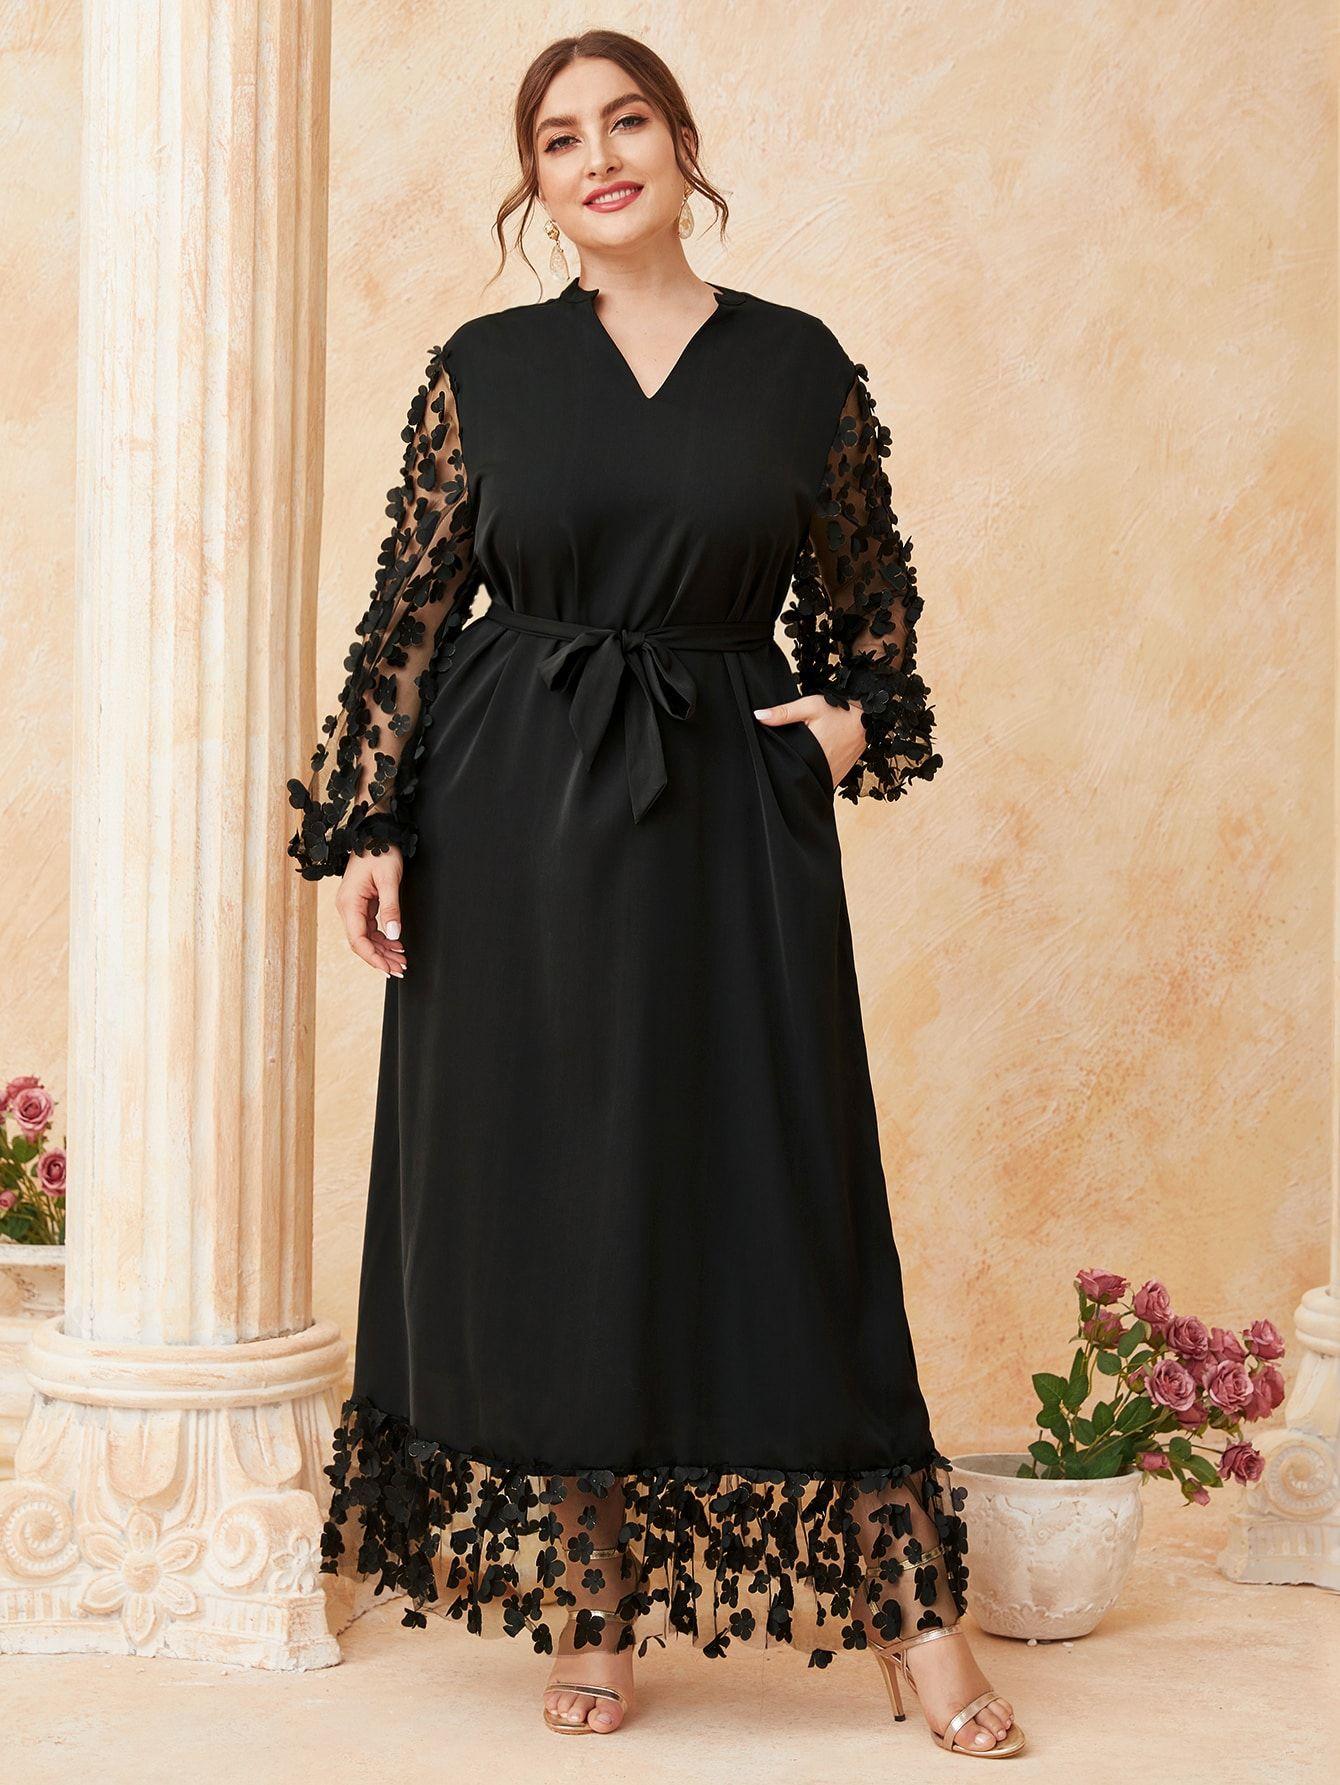 Plus 3d Applique Detail Belted Dress Shein Usa Dress Body Type Dresses Belted Dress [ 1785 x 1340 Pixel ]